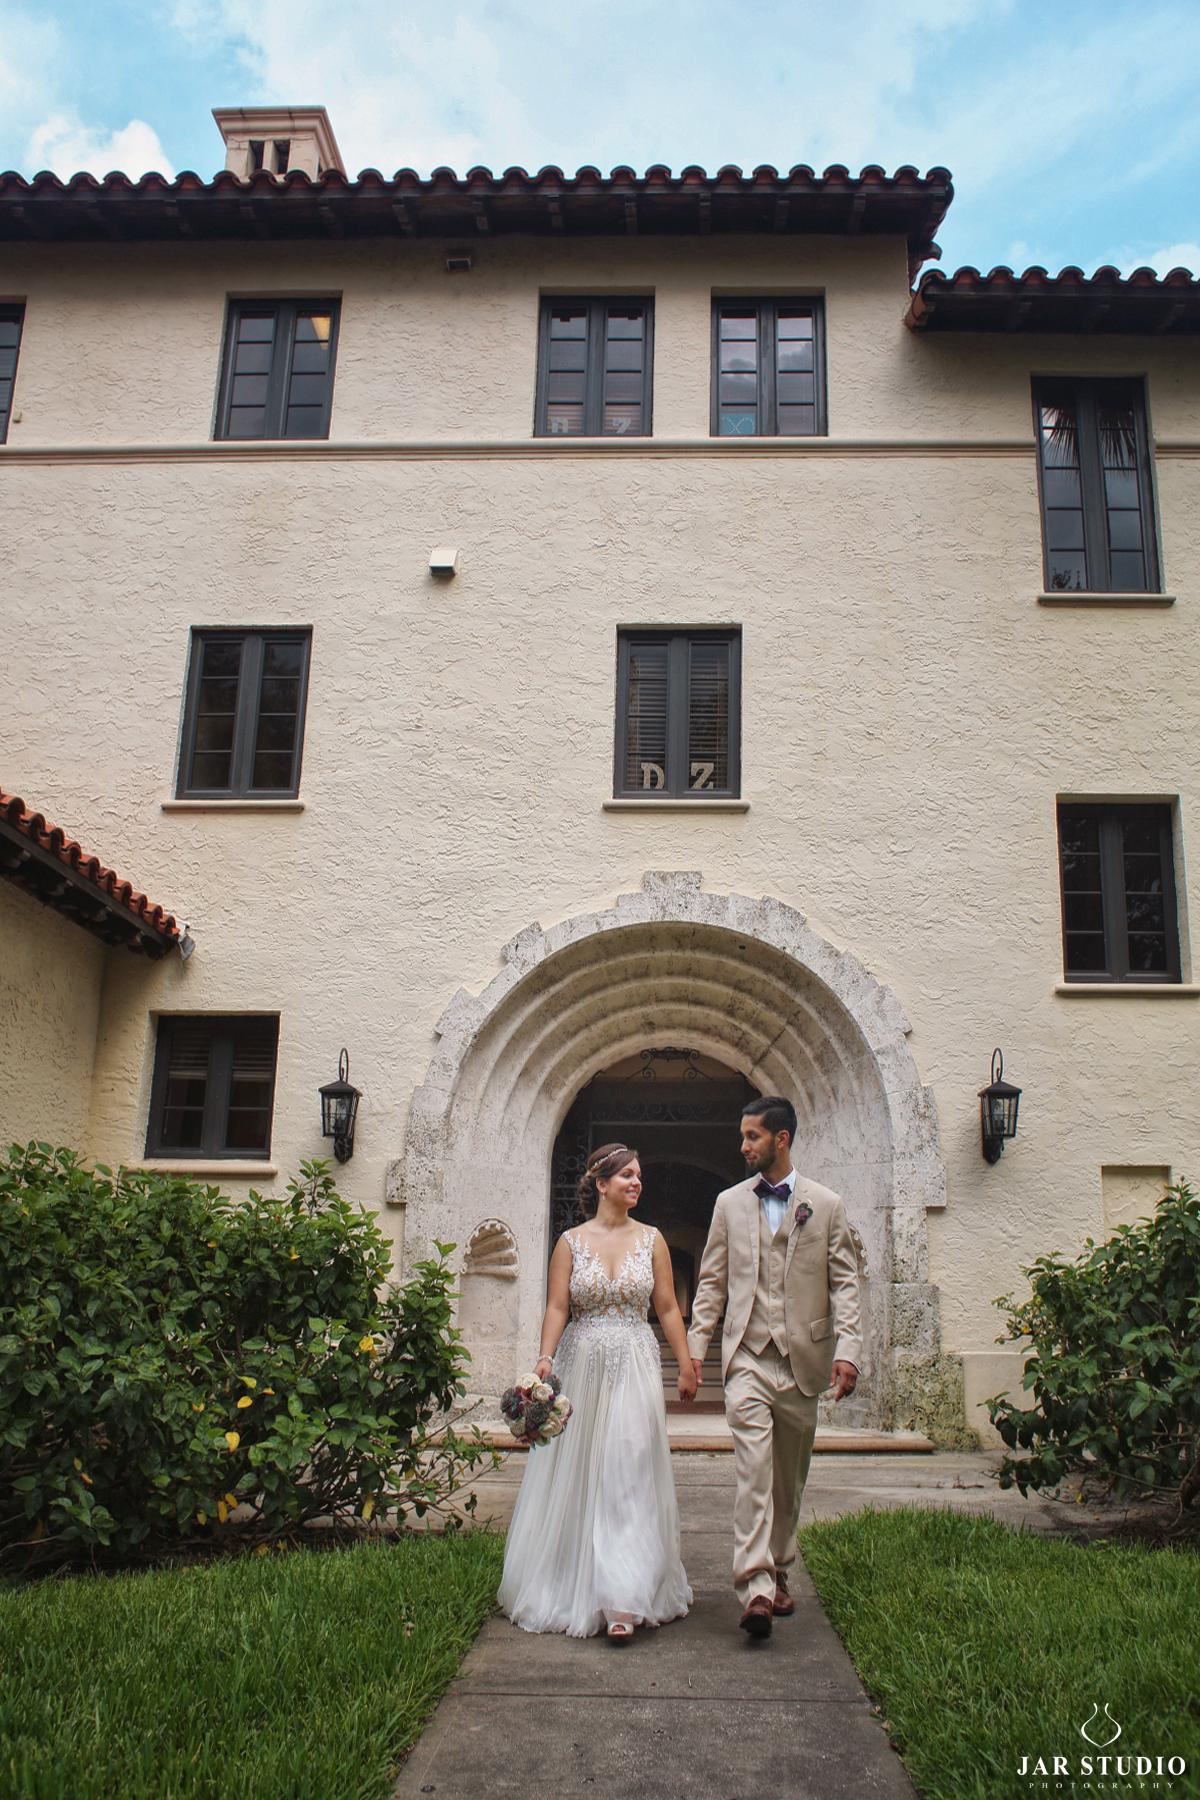 college-dorm-idea-jarstudio-wedding-photographer-437.JPG